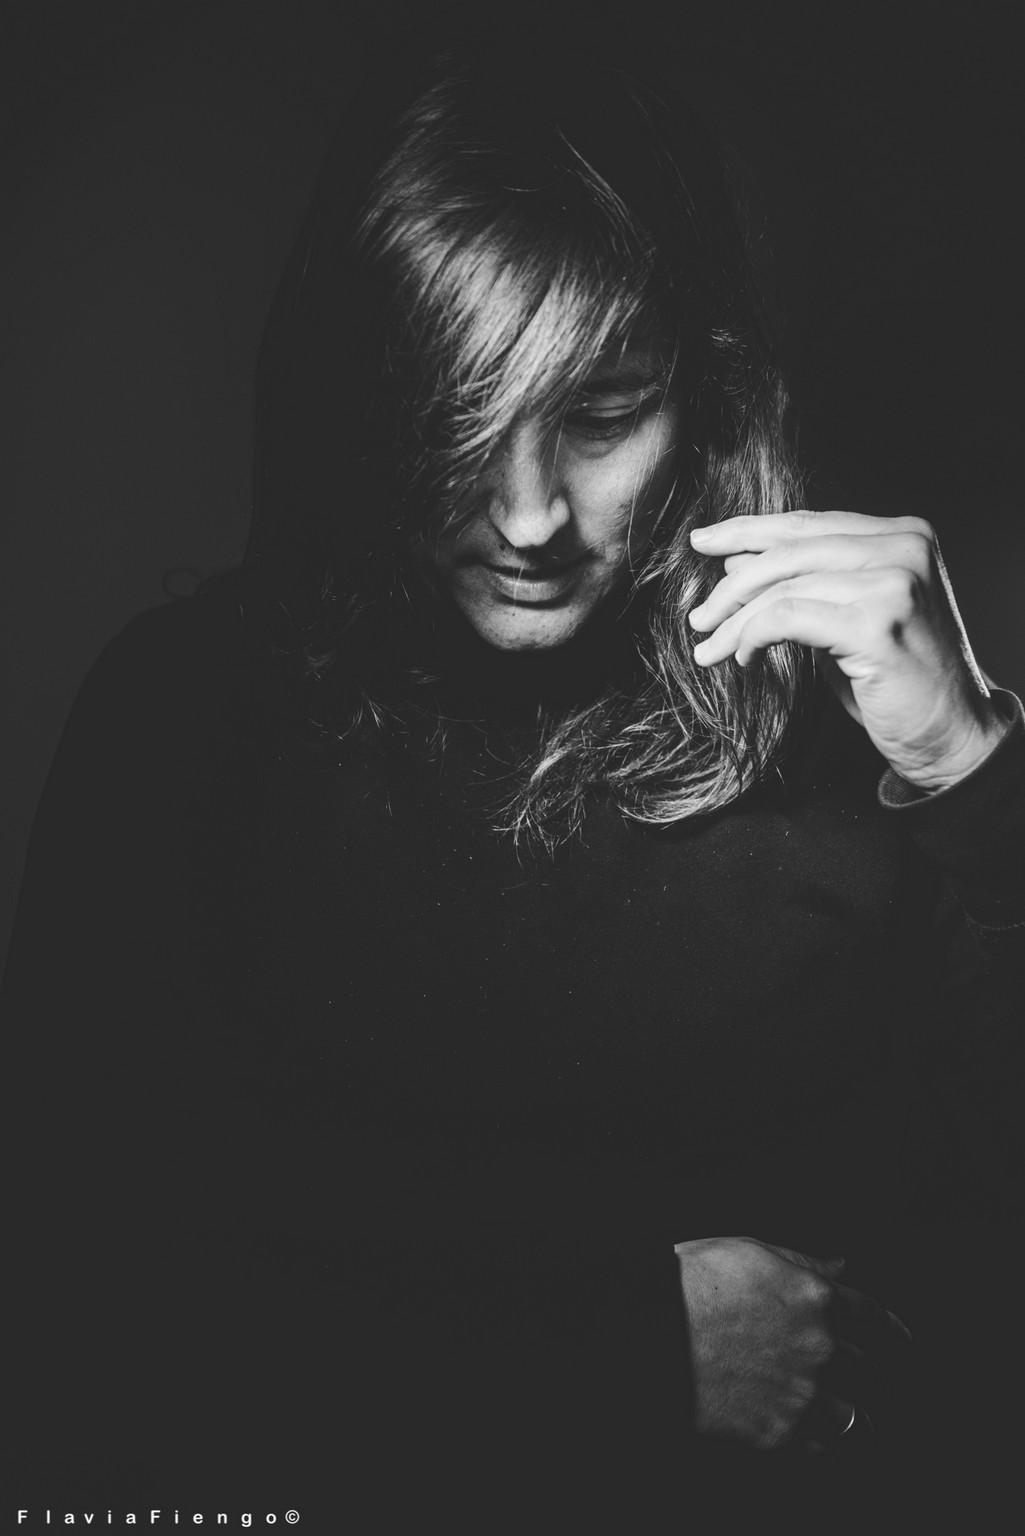 Flavia_Fiengo_portrait00017